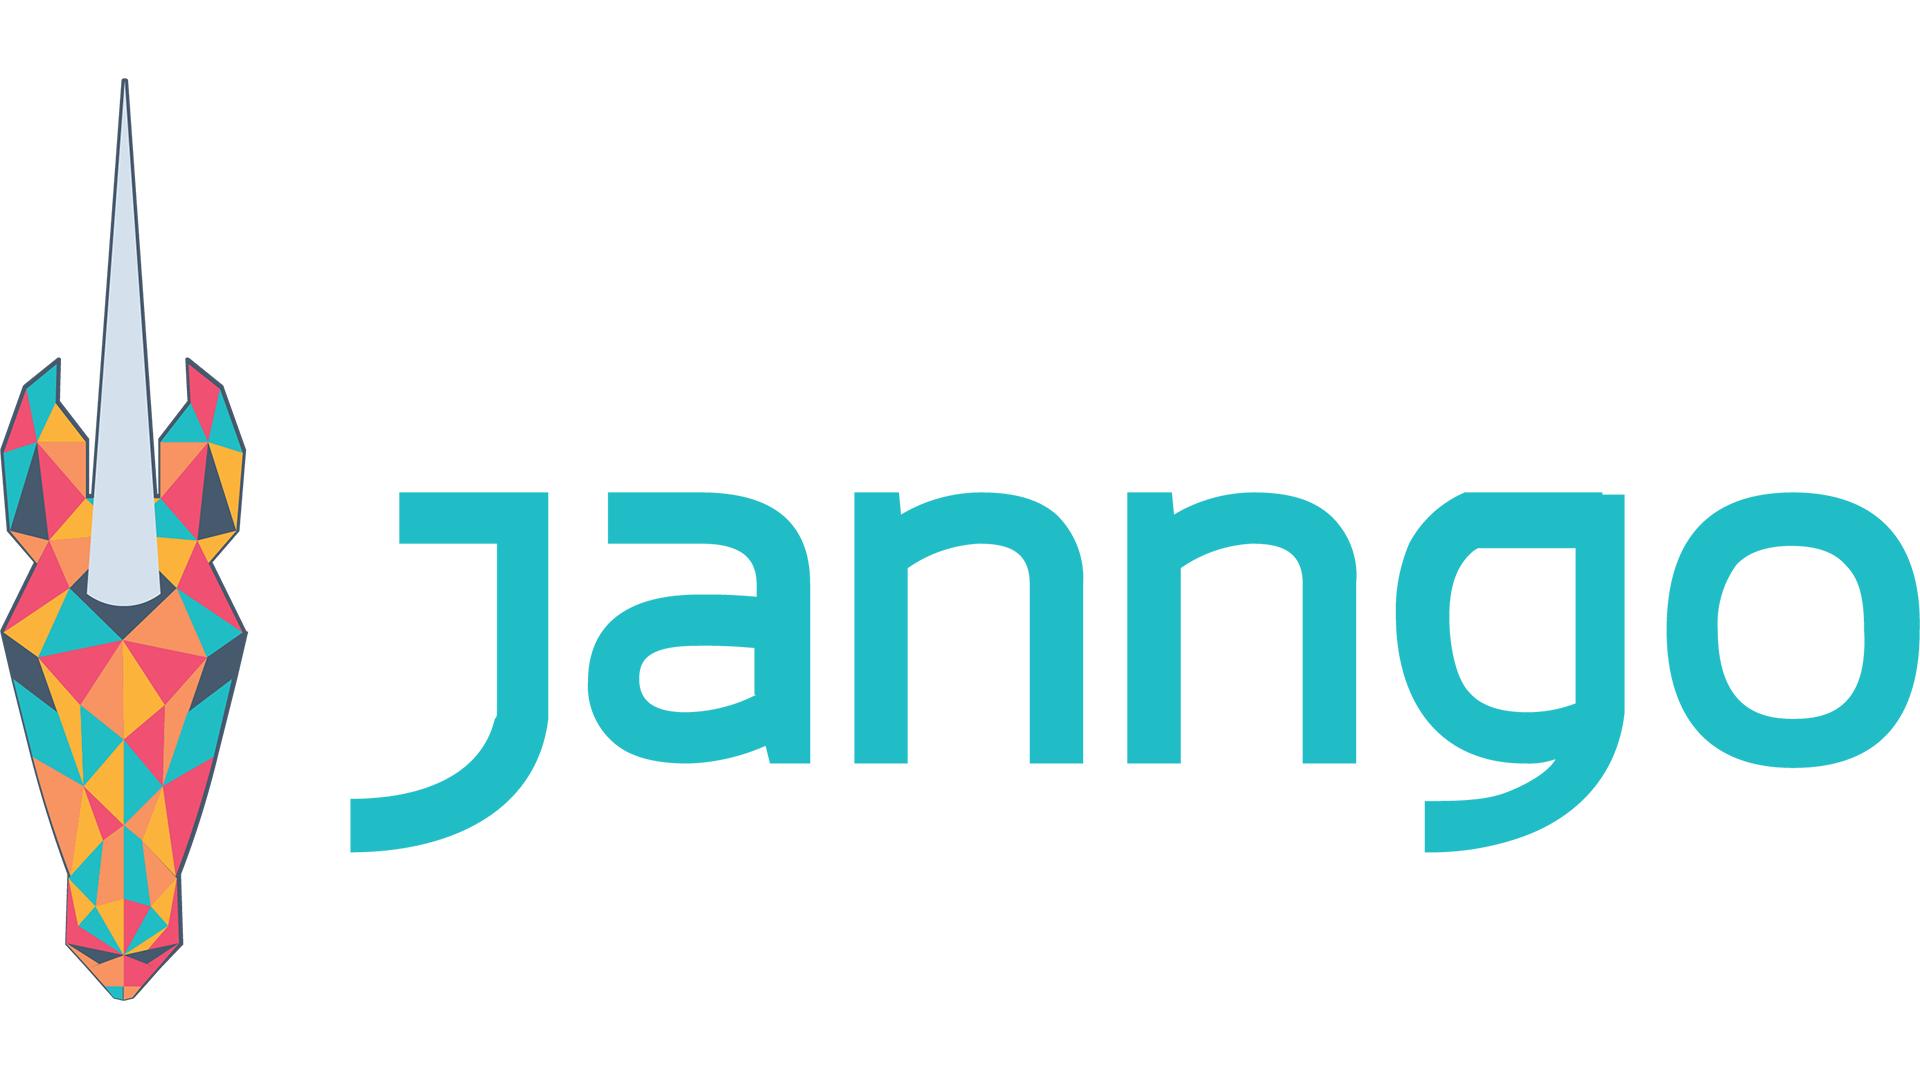 La start-up Janngo a été créée en 2018.